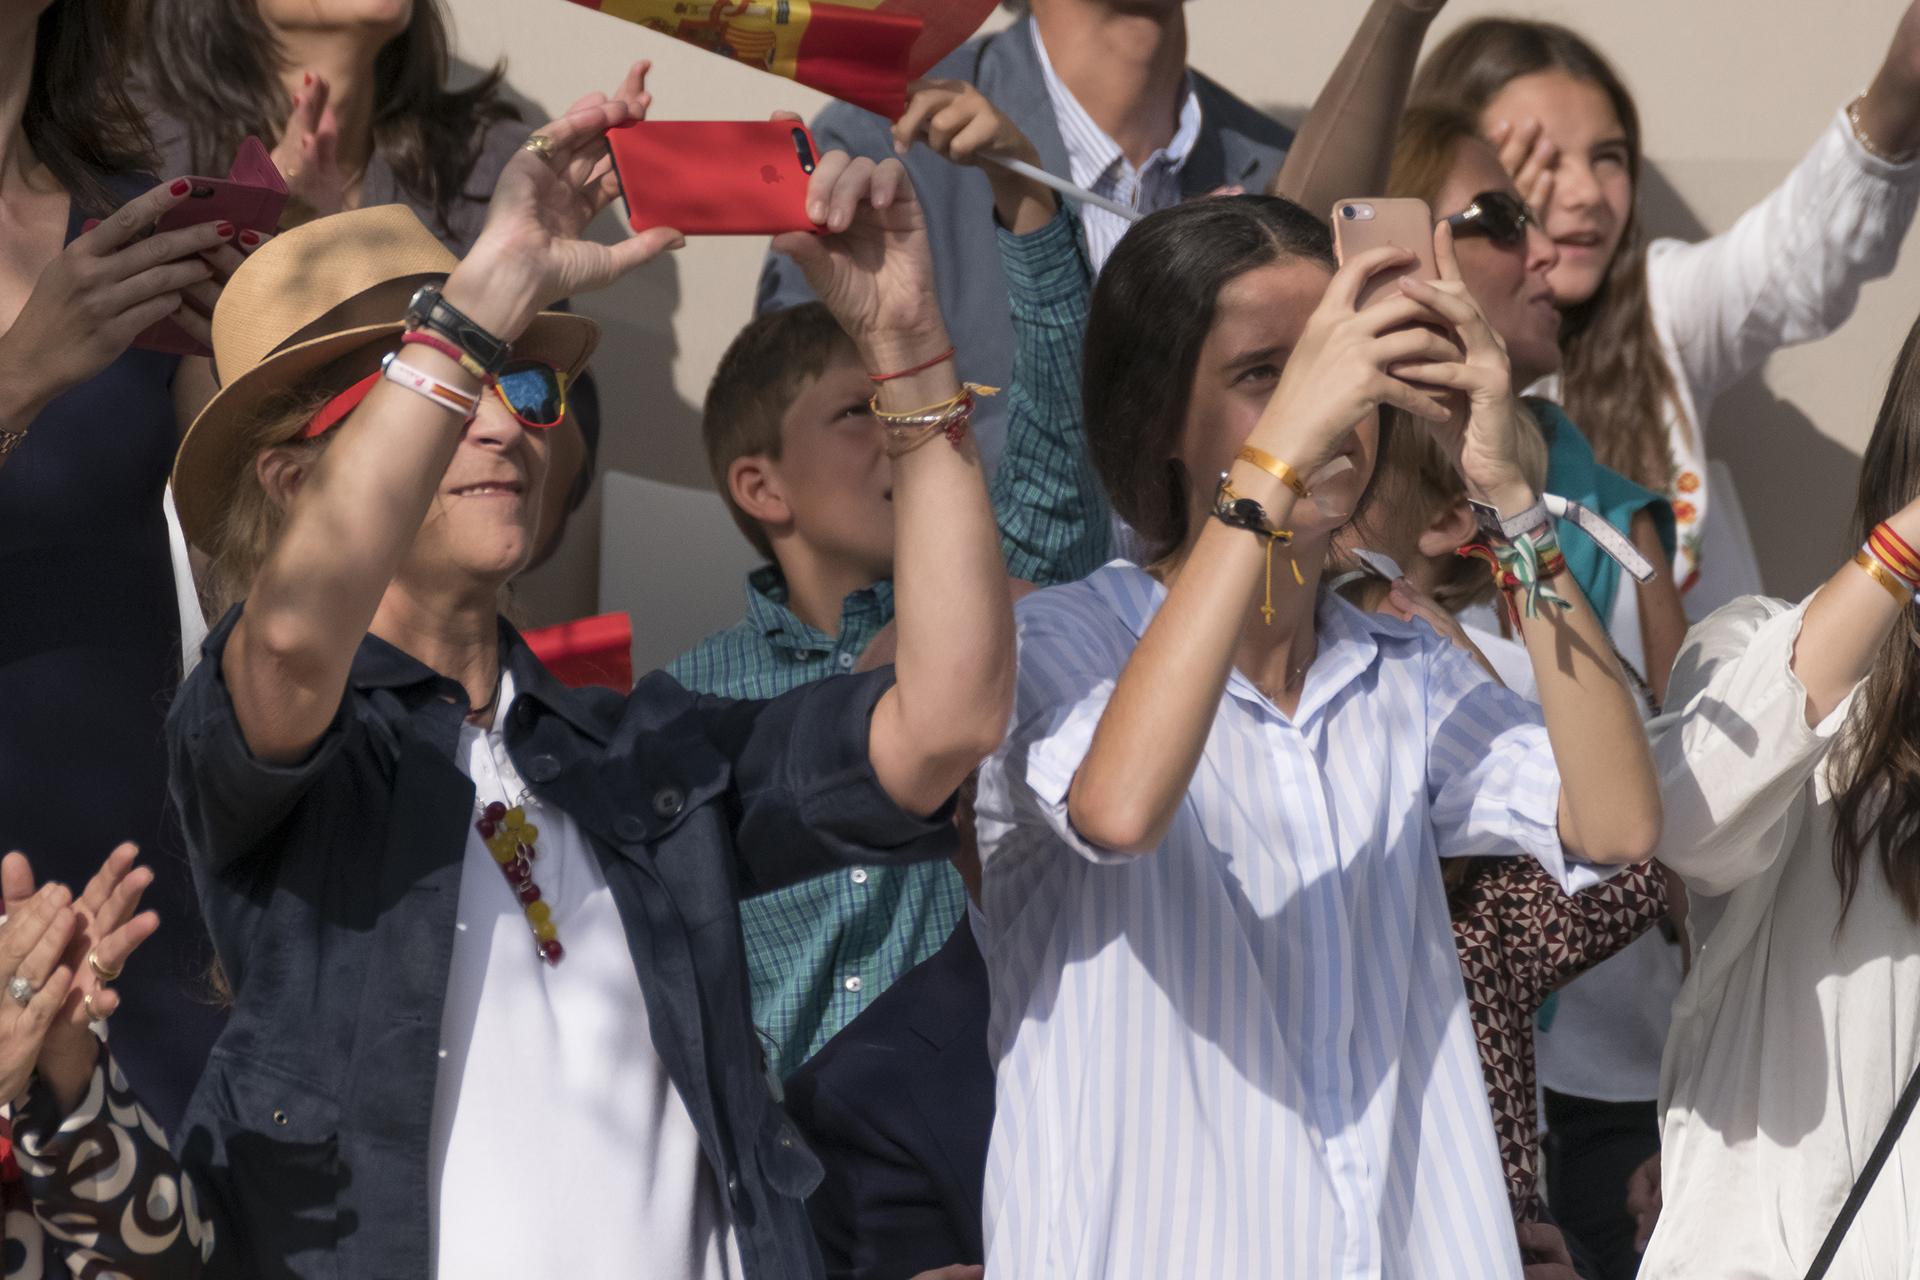 La Infanta Elena tomando fotos con su hija durante la emotiva ceremonia